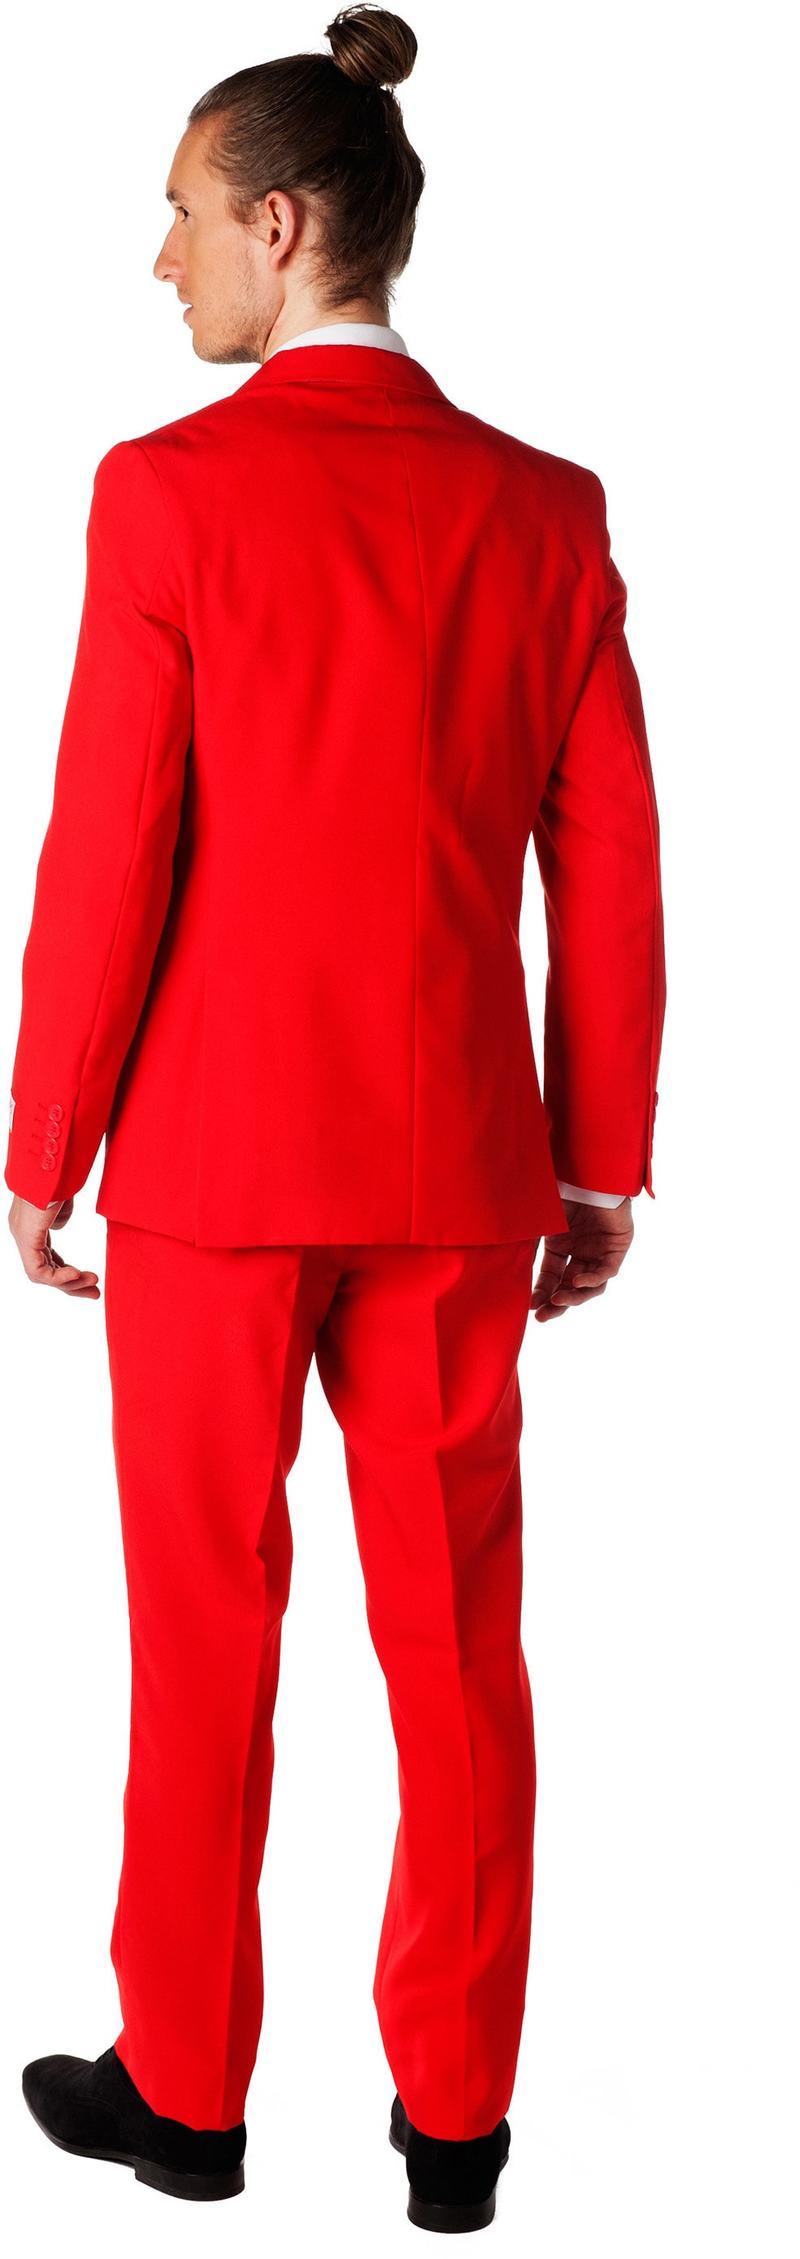 OppoSuits Red Devil Kostüm Foto 1